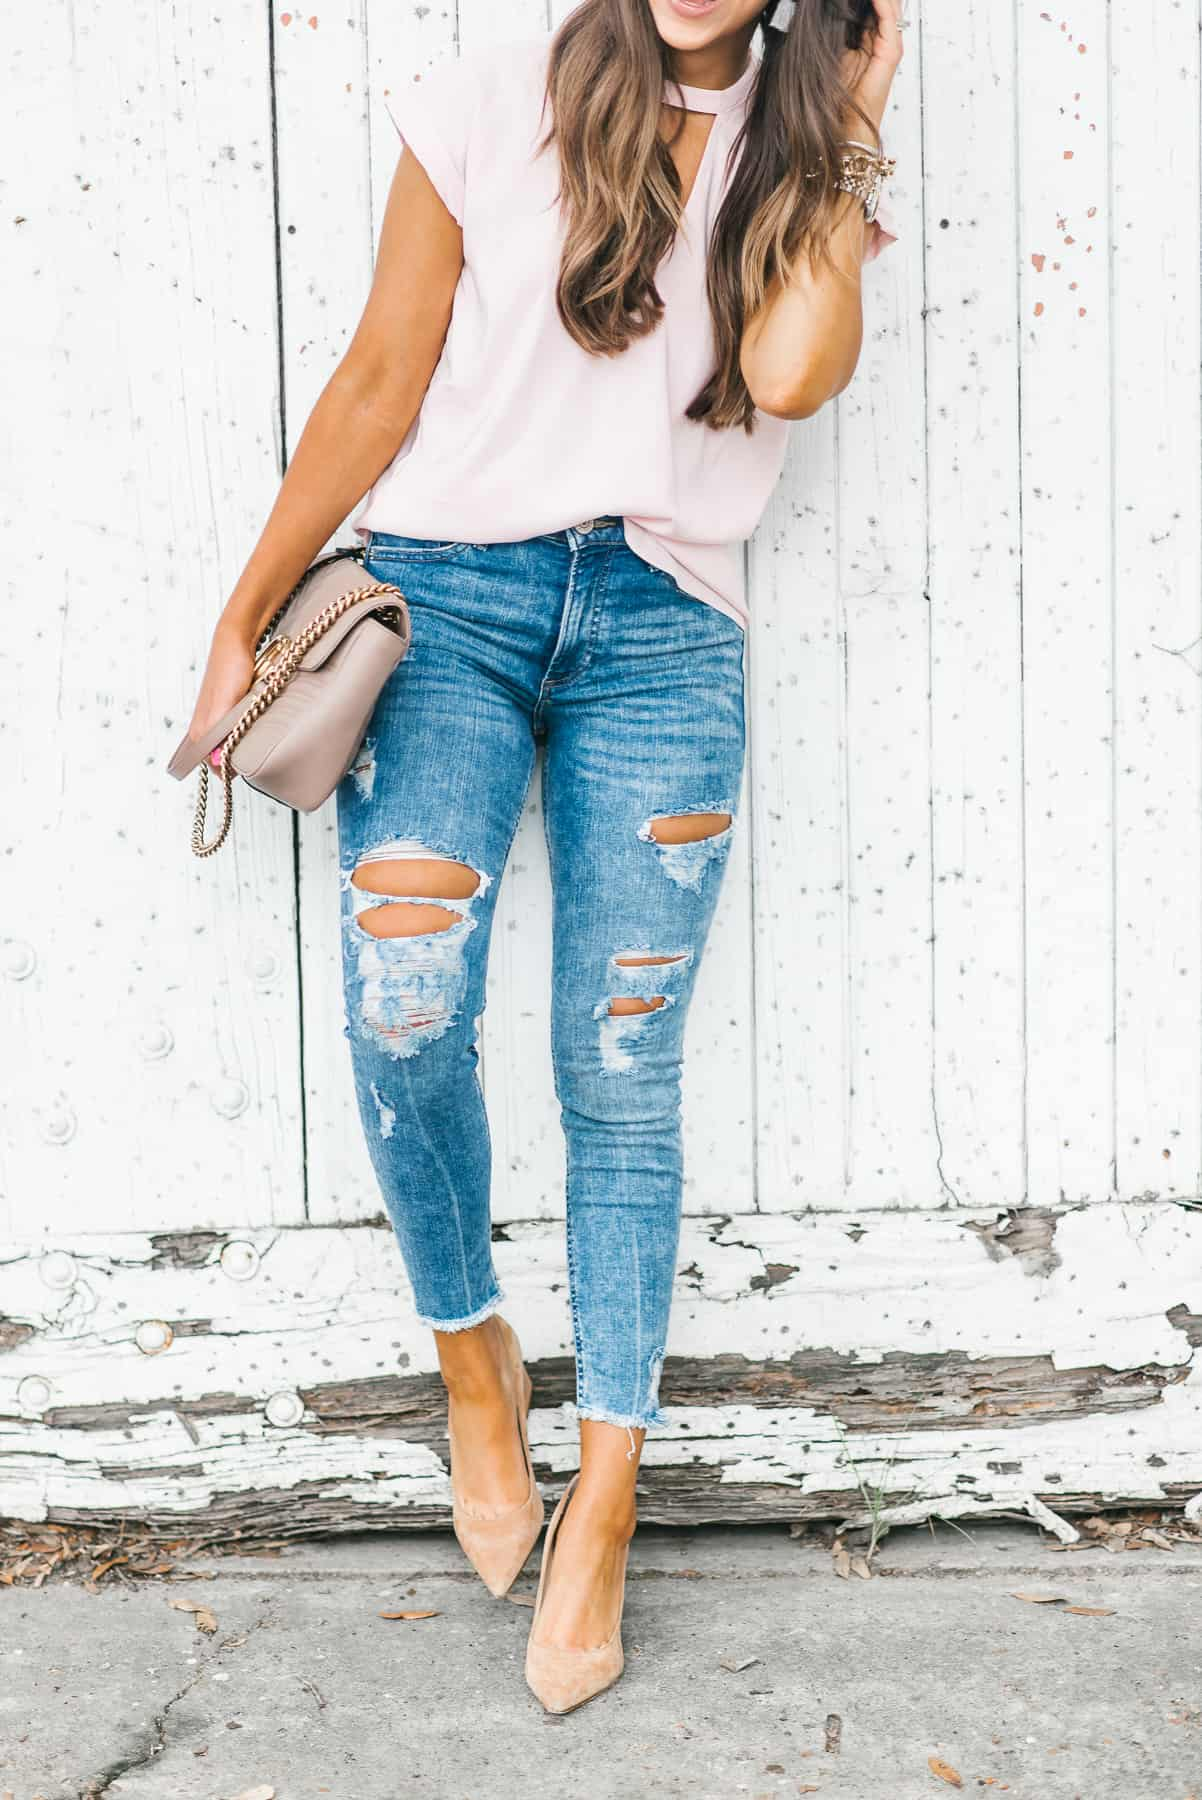 Dress Up Buttercup, Dede Raad, Houston Blogger, Fashion Blogger, Best Distressed Denim